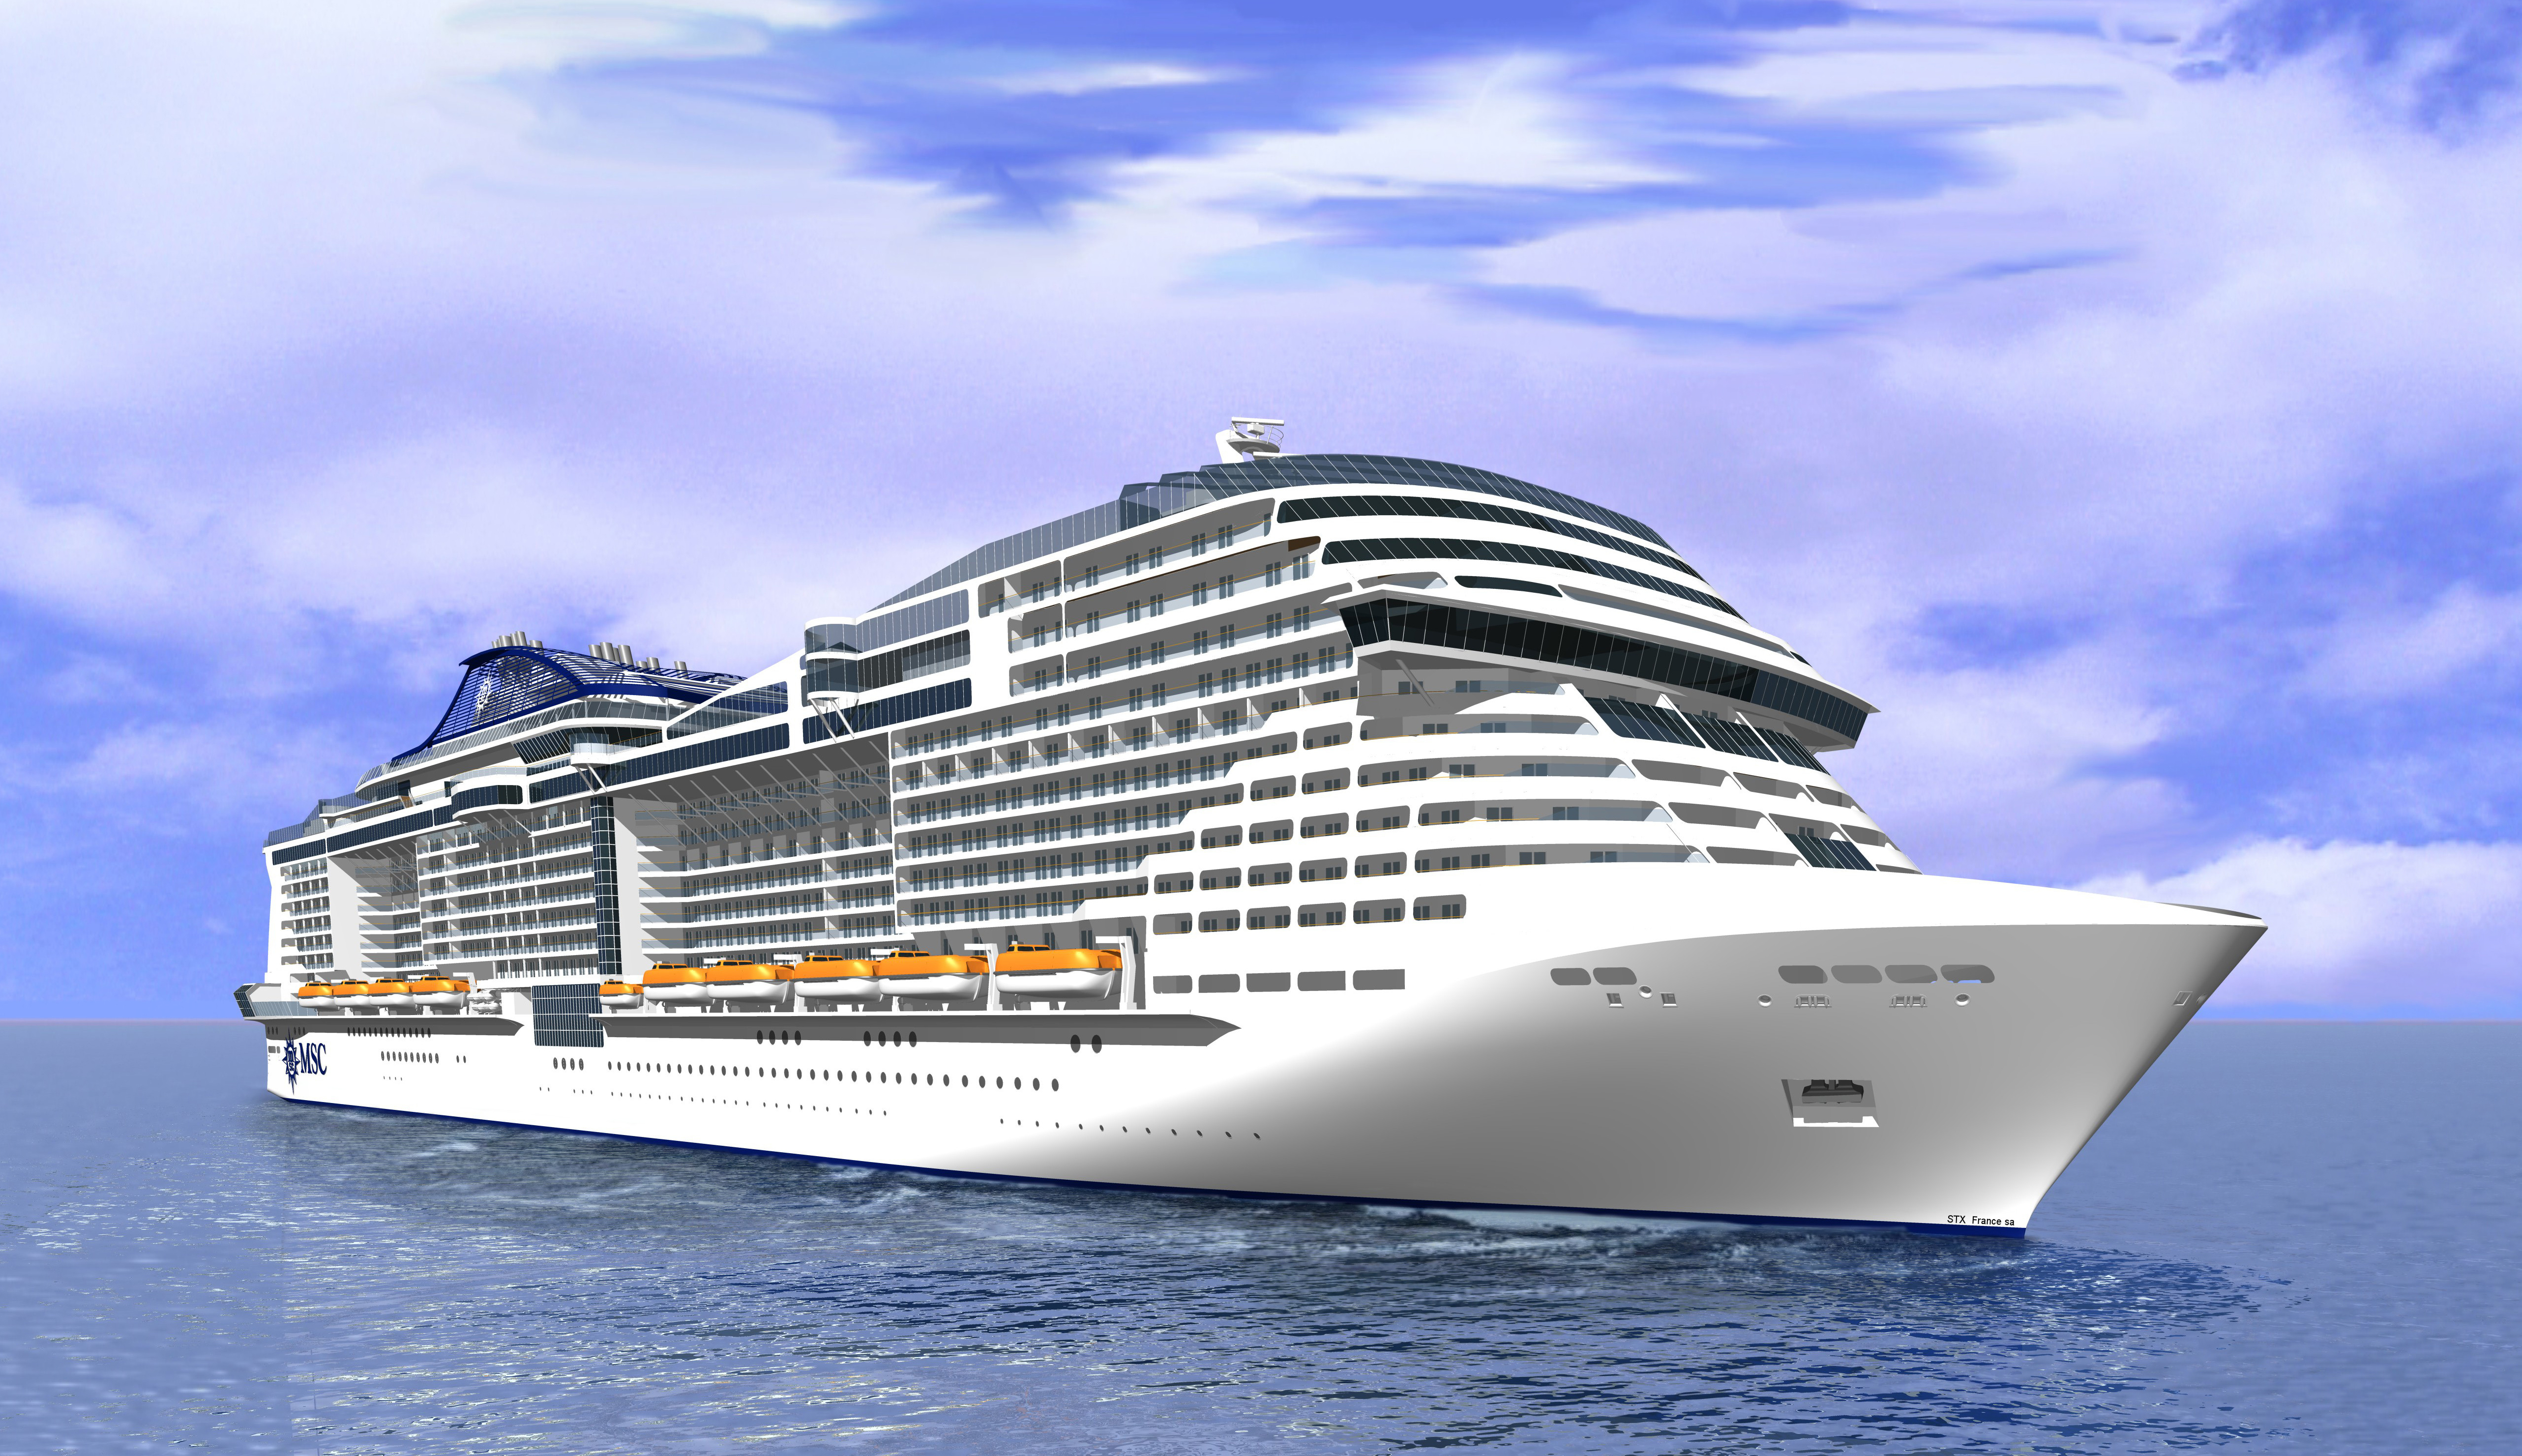 MSC Meraviglia kan ta 5700 gäster. Foto: MSC Cruises